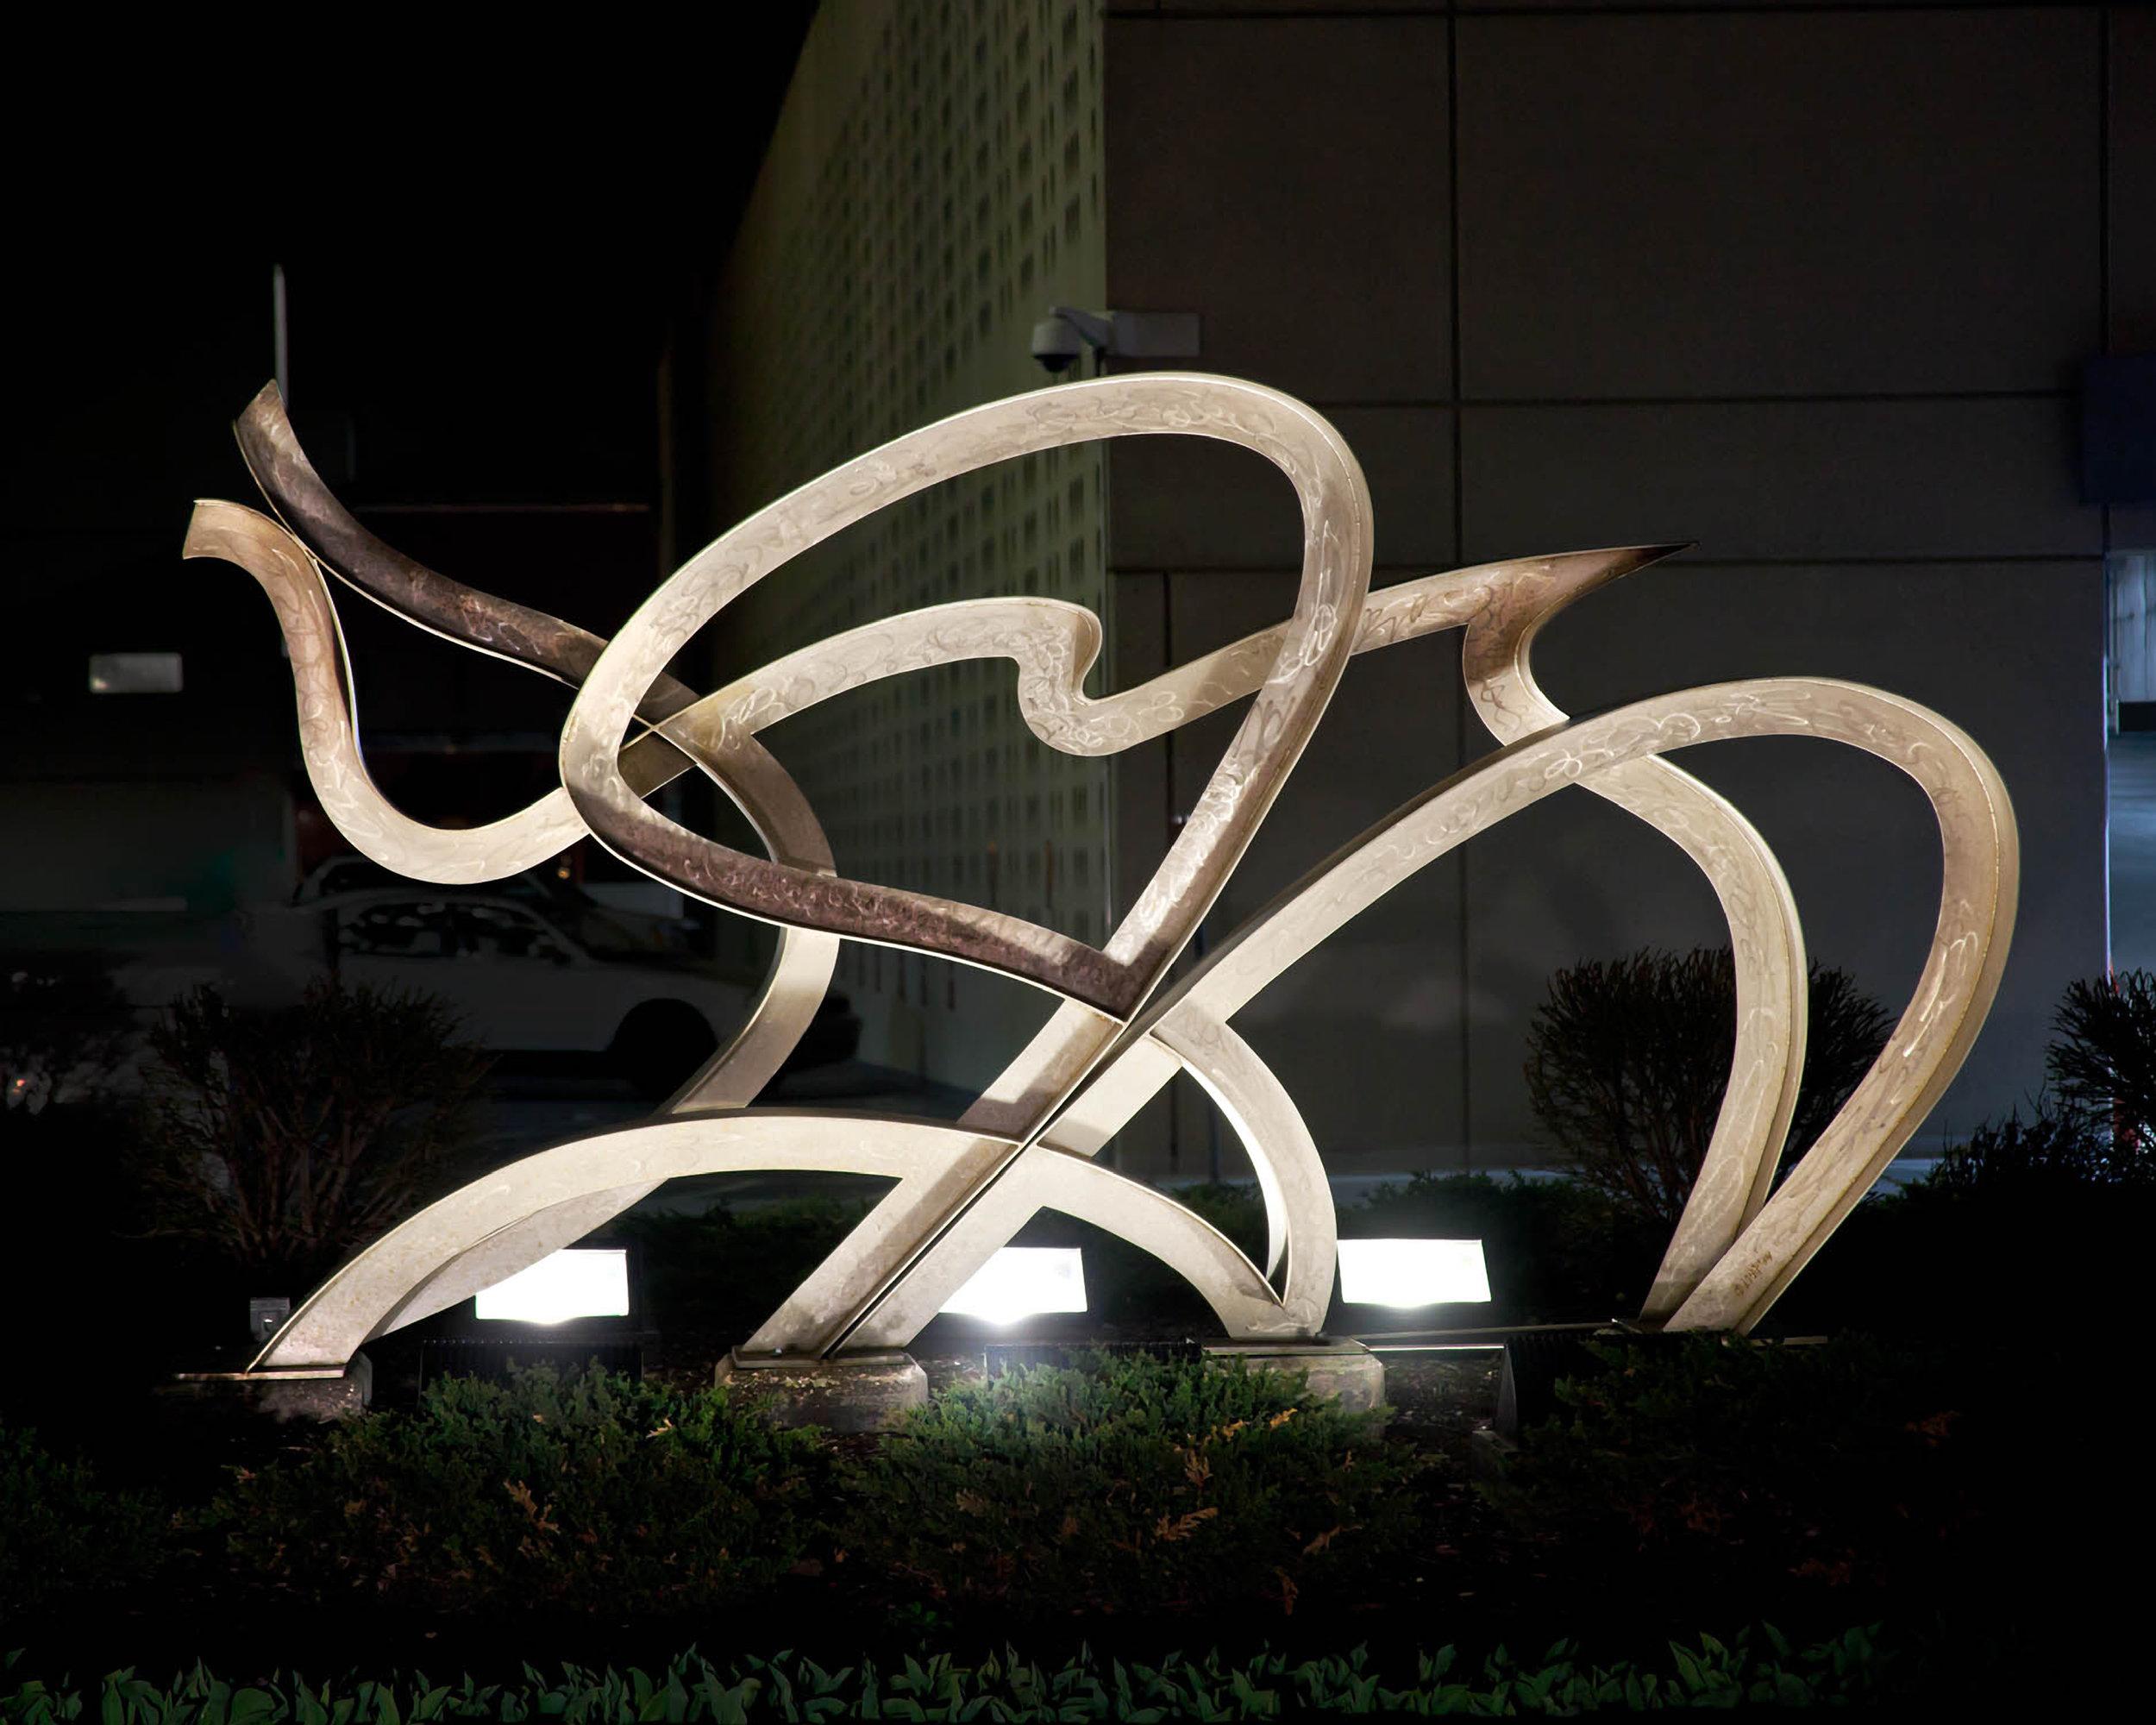 Freedom  2004, stainless steel, 6x11x2 ft  Plaza Library 4801 Main Street Kansas City, MO